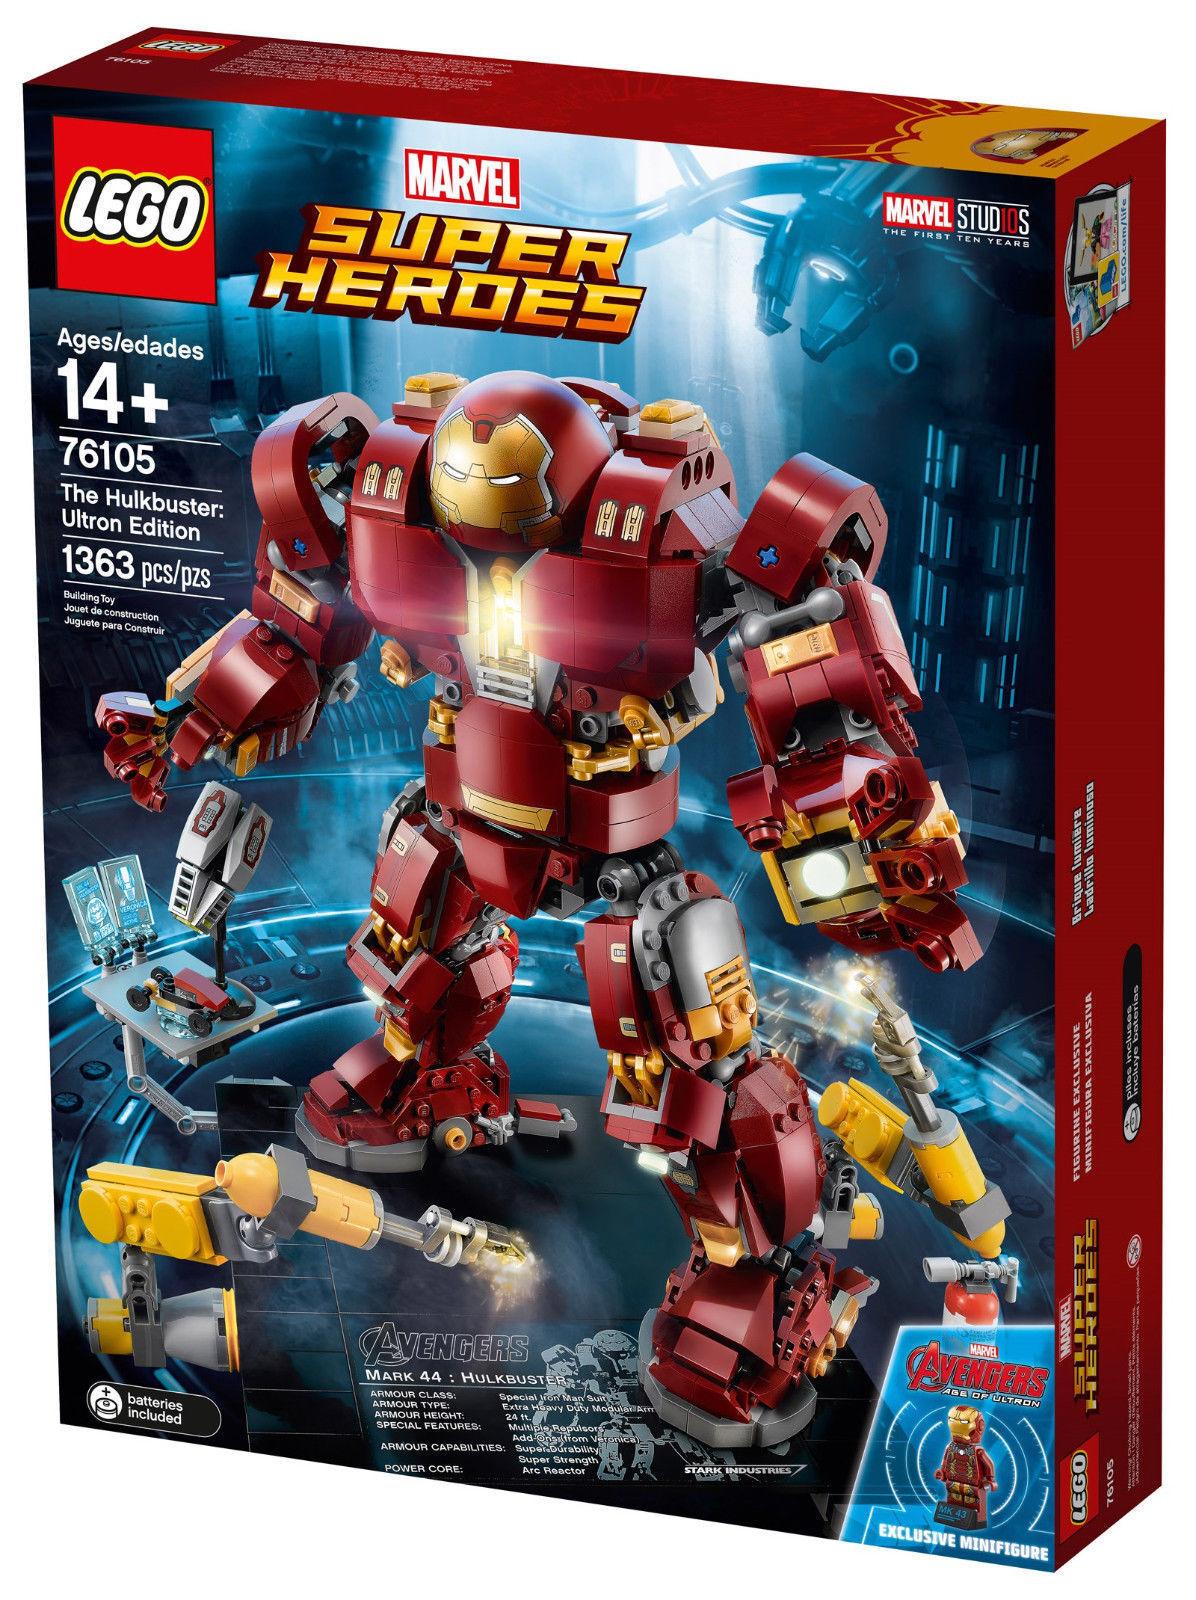 LEGO 76105 Hulkbuster  Ultron Edition  SUPER HEROES 14+ Pz 1363